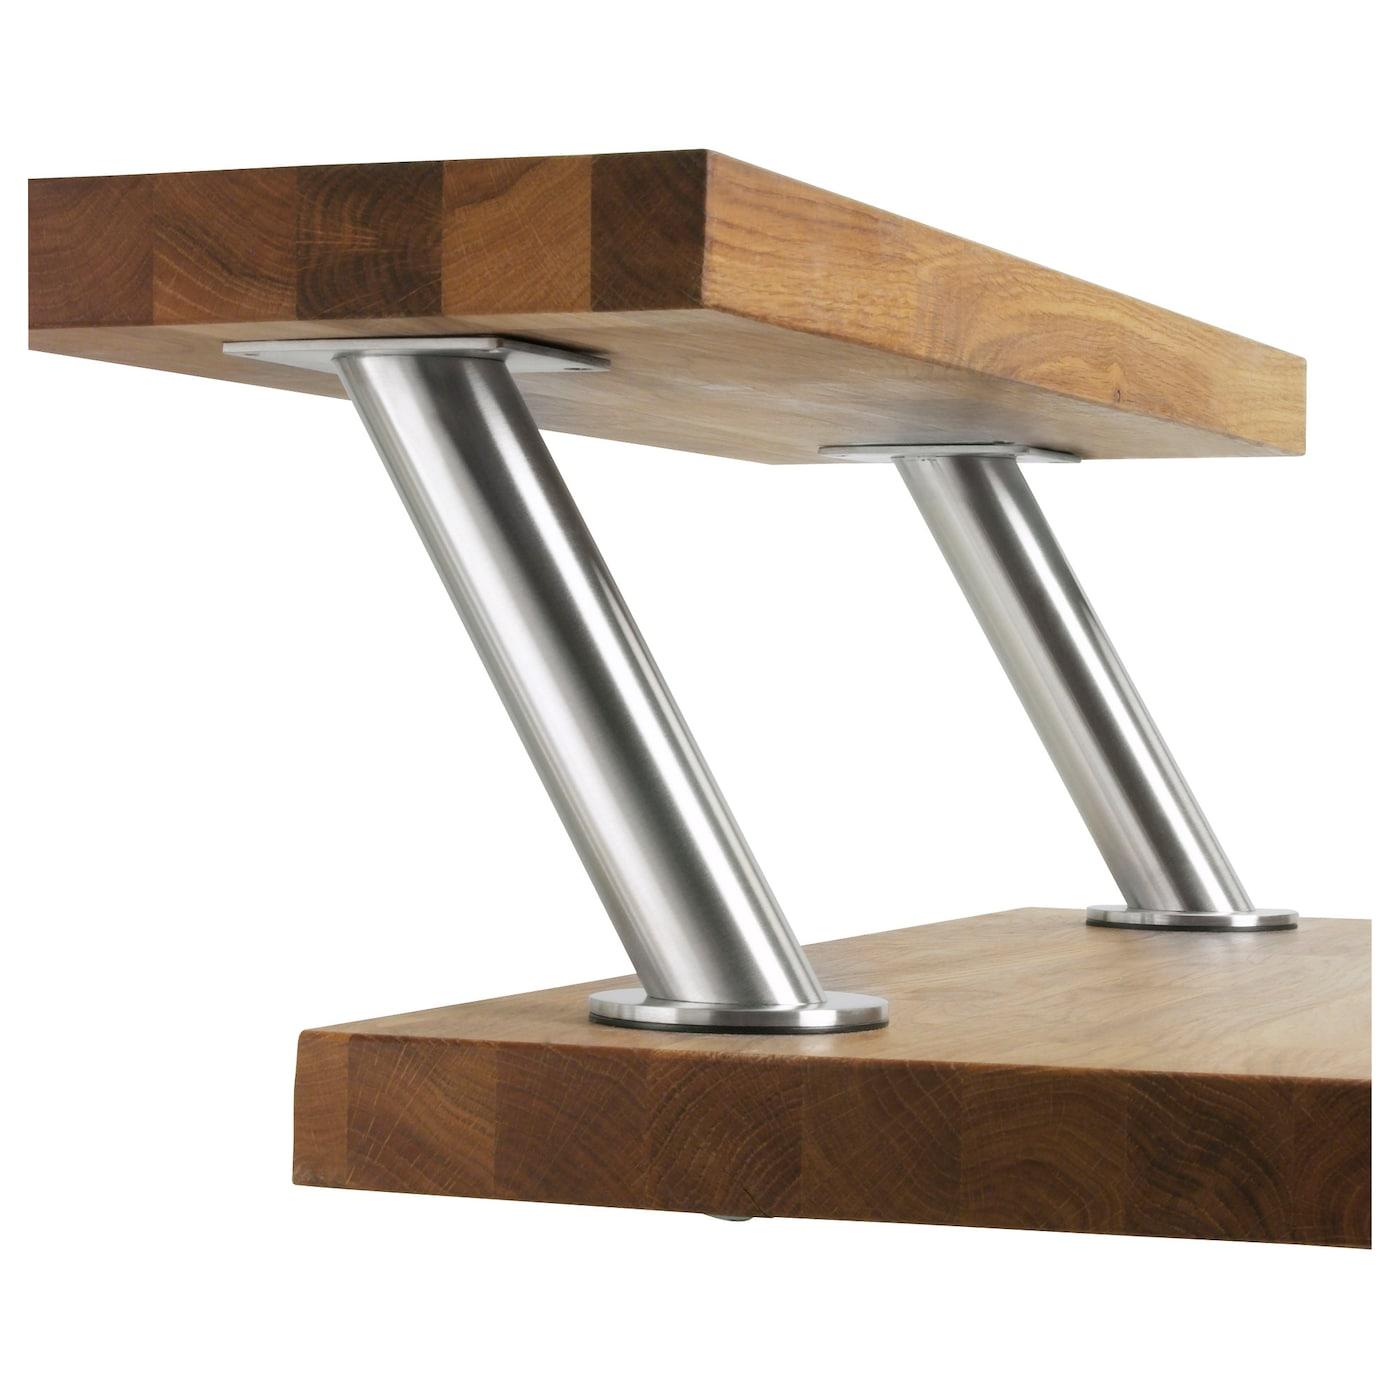 capita console acier inoxydable ikea. Black Bedroom Furniture Sets. Home Design Ideas